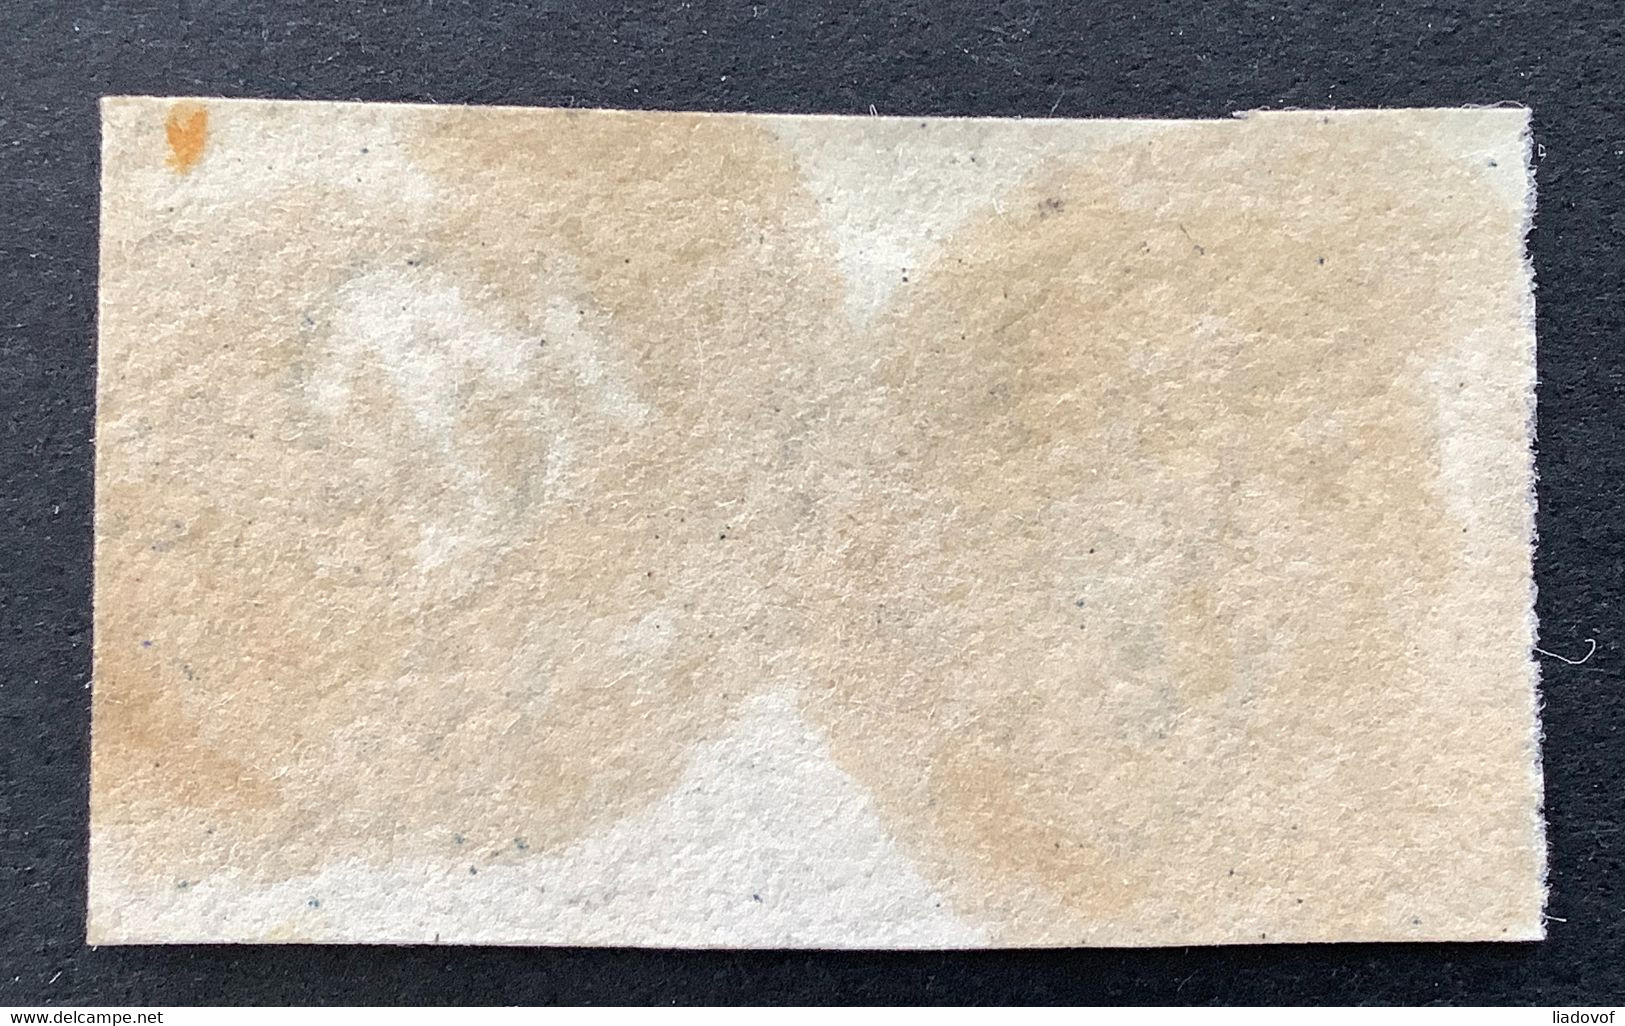 Medaillon 7 - 20c Gestempeld P106 ST. TROND - IN PAAR - 1851-1857 Medaglioni (6/8)